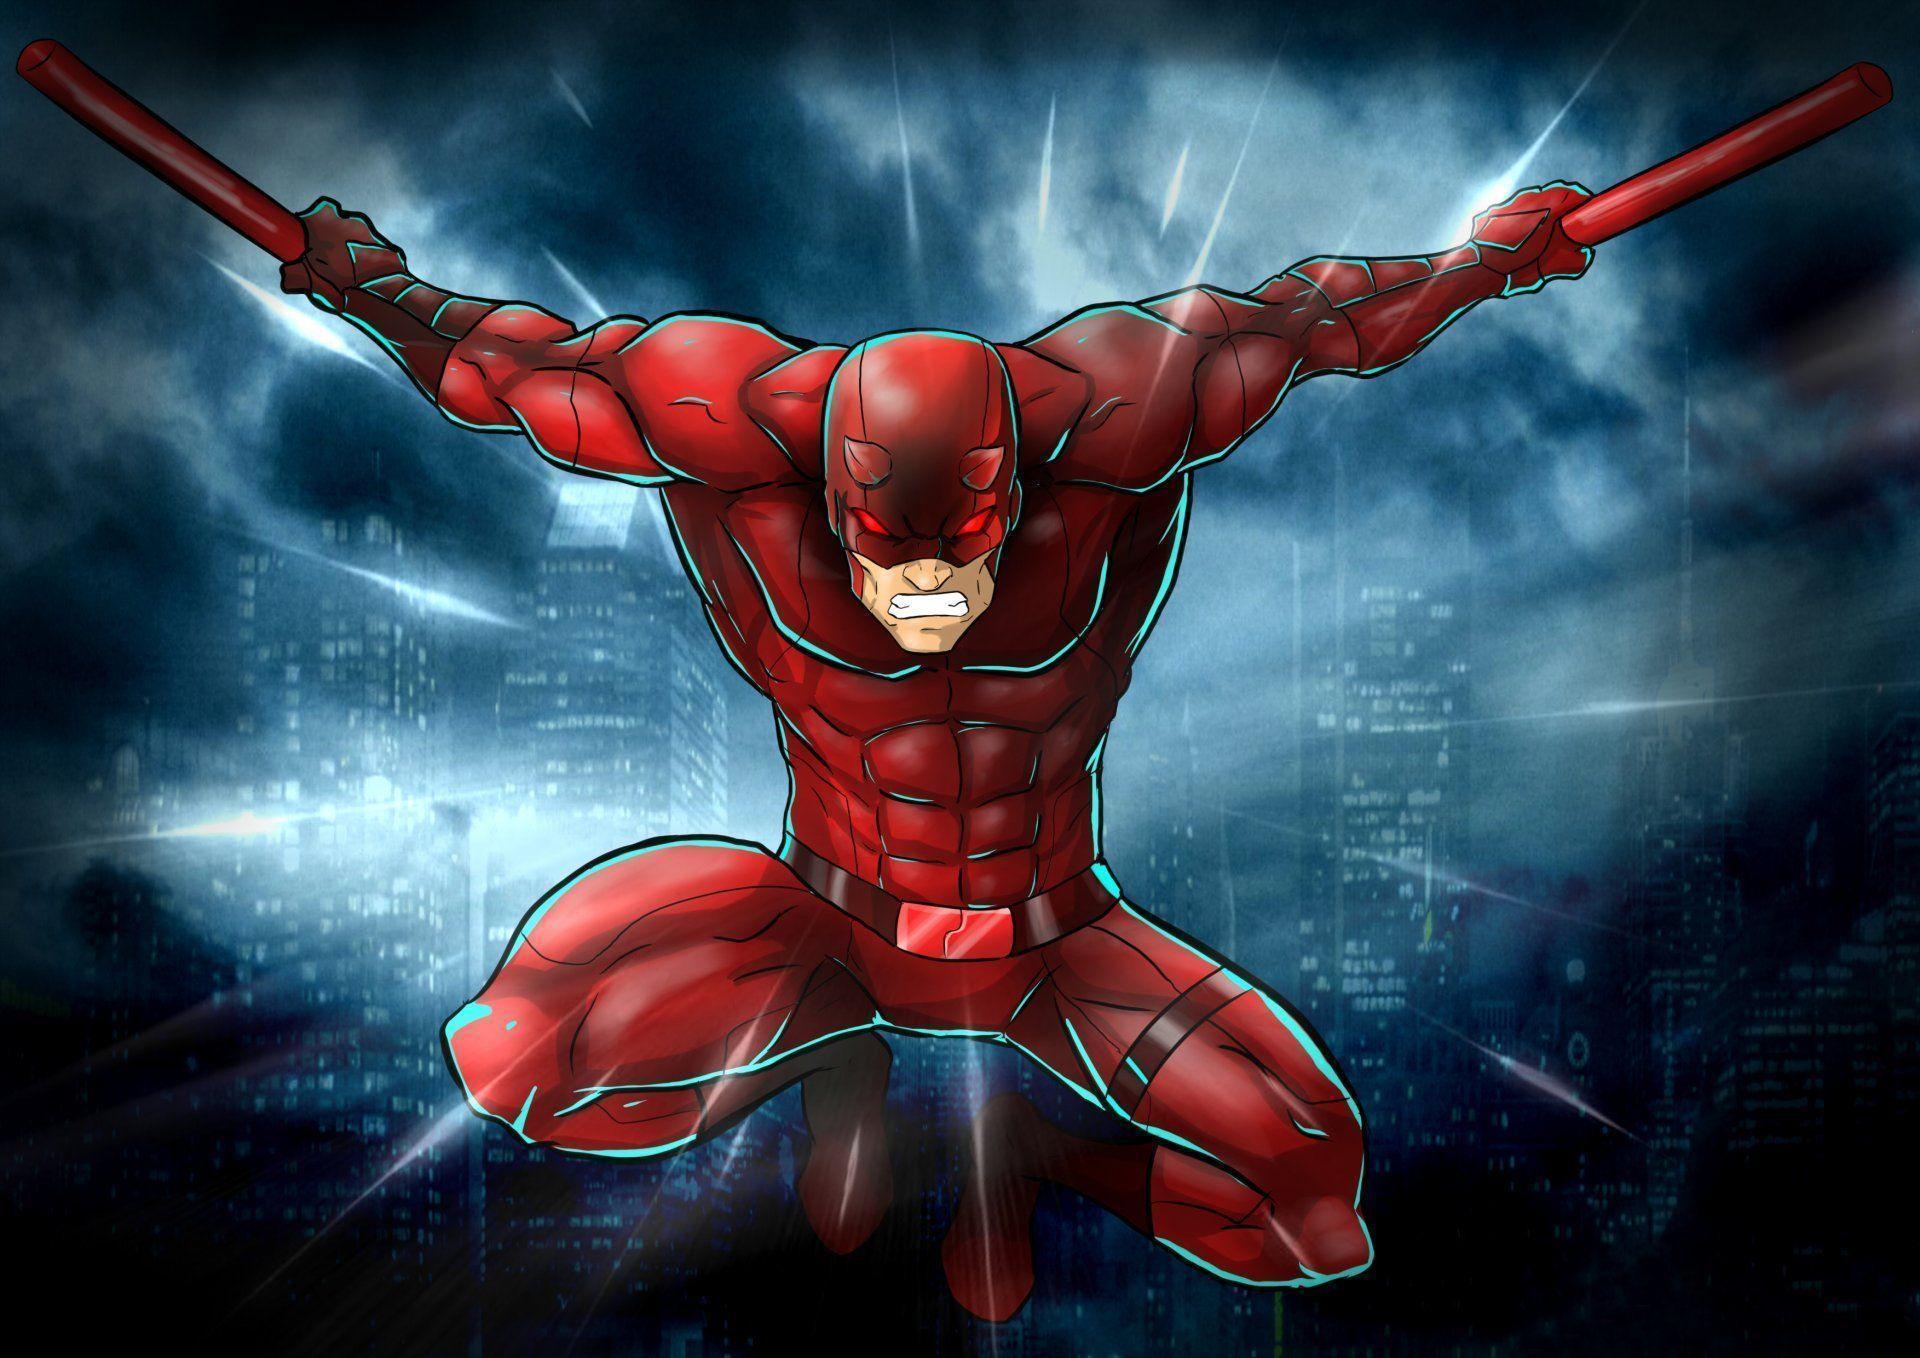 Daredevil Marvel Wallpapers - Wallpaper Cave